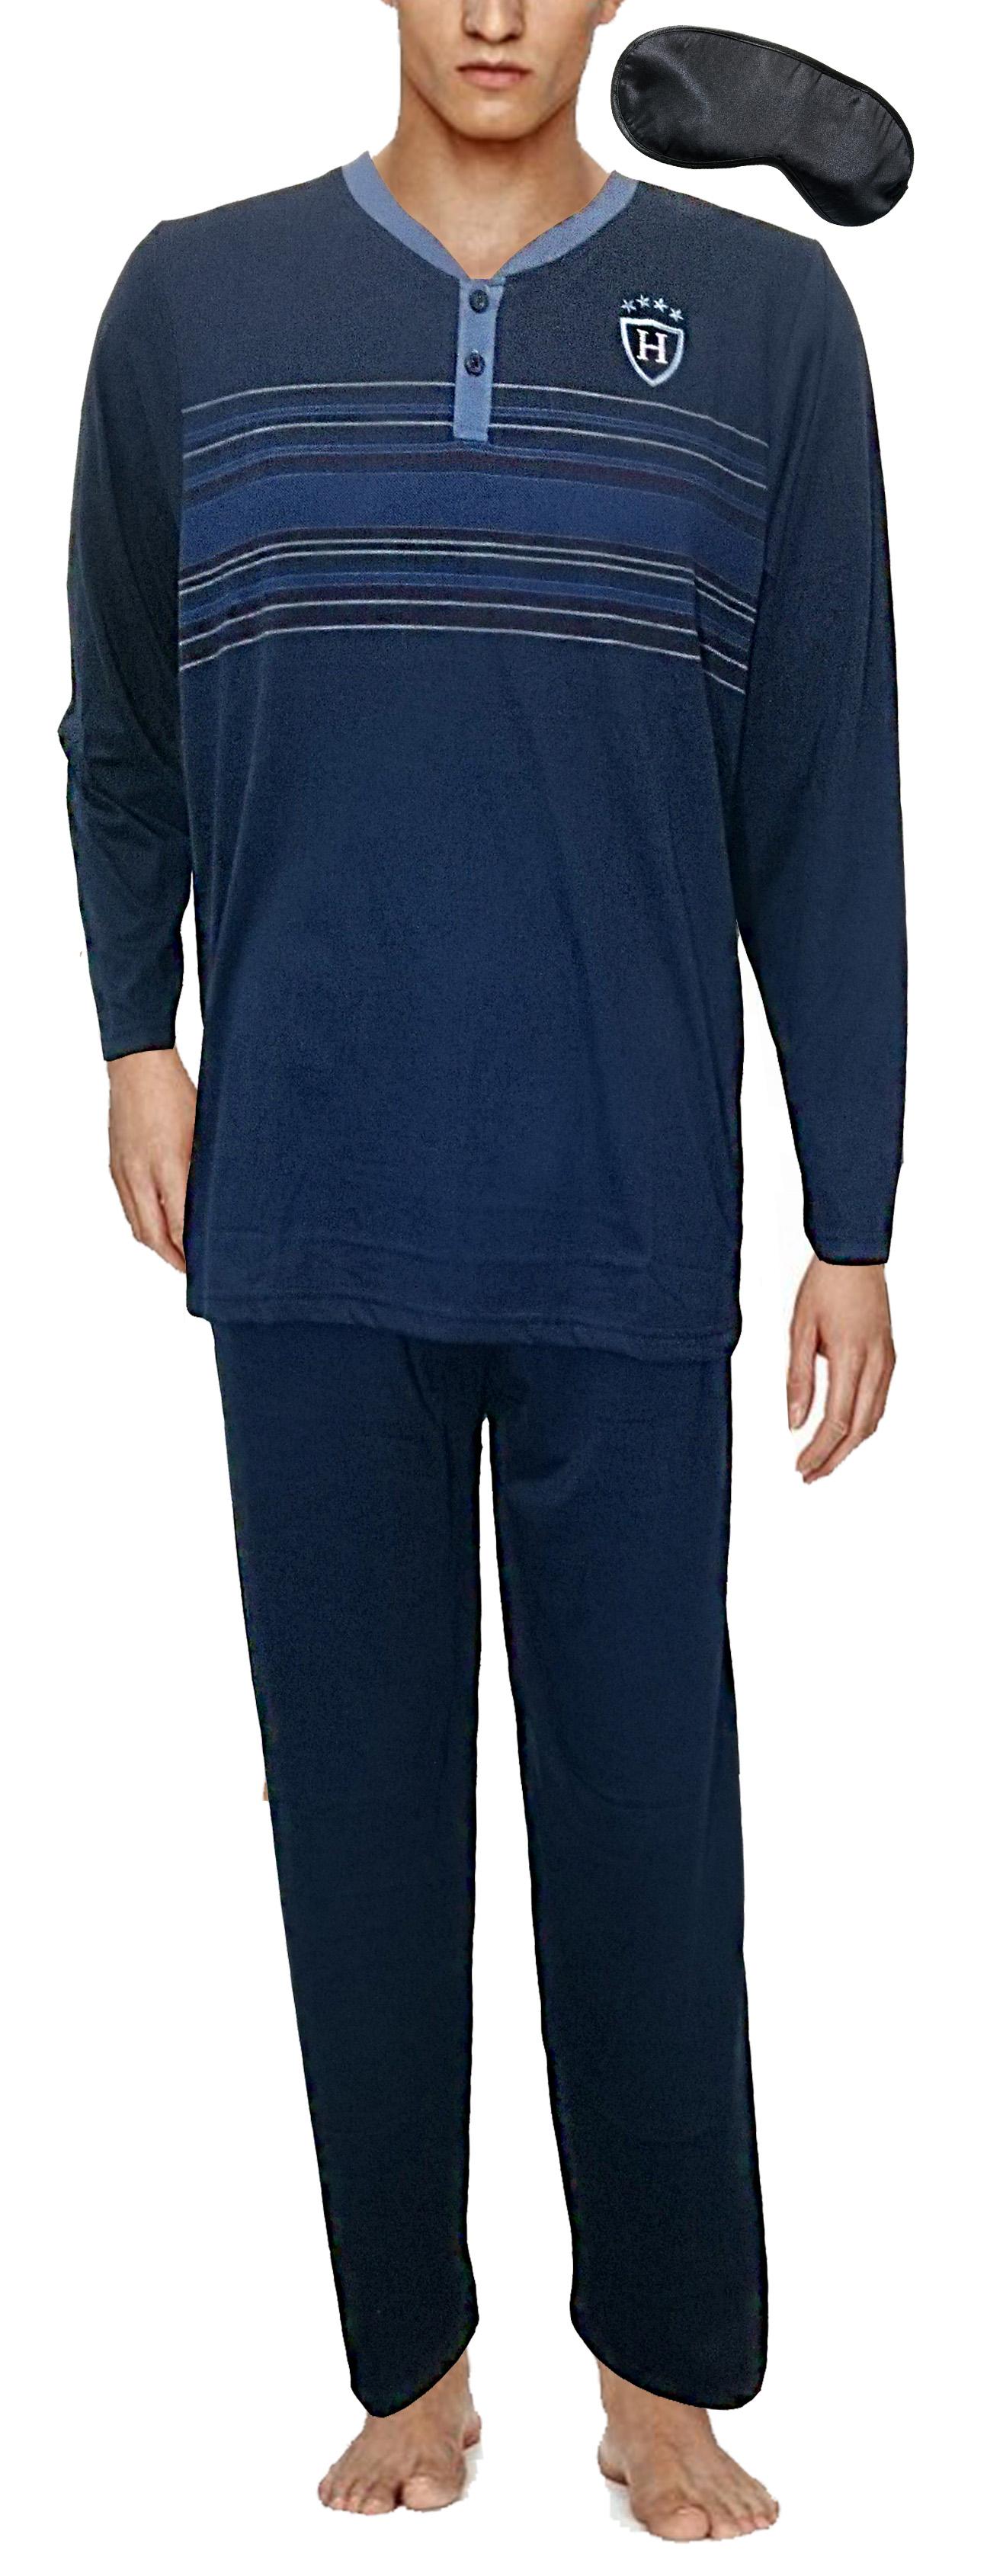 bc0f346b33 ... I-Smalls Men's Men's Men's Traditional Pattern Flannel Soft Cotton  Pyjama Set (M to ...